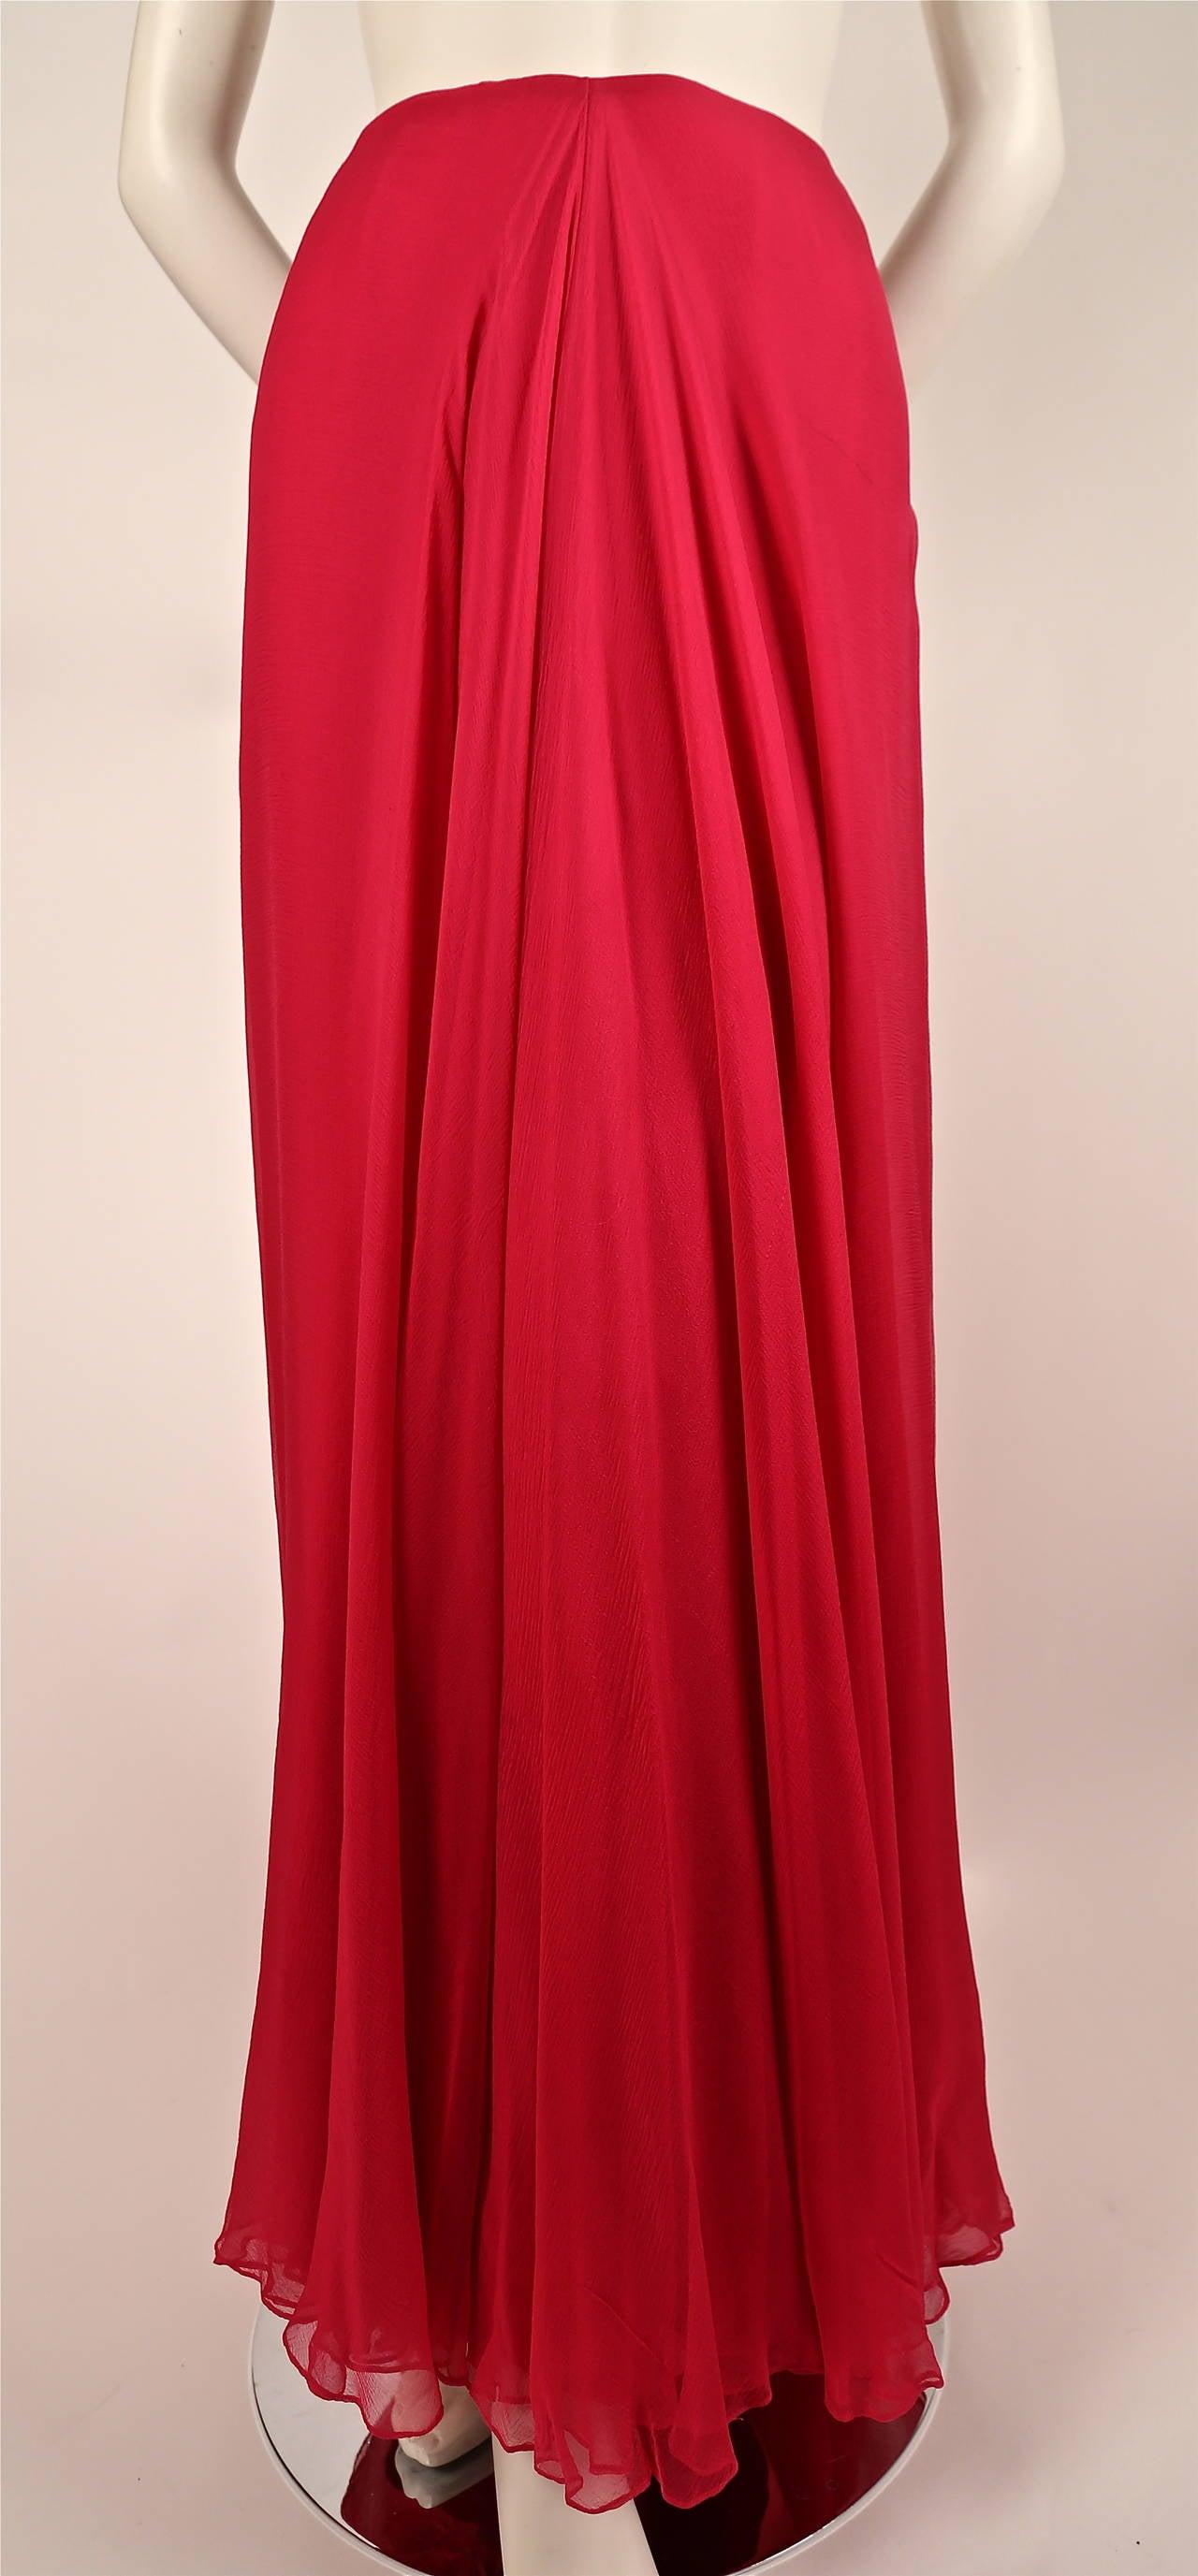 1960's MADAME GRES fuchsia beaded slub silk tabard & silk chiffon skirt ensemble 4